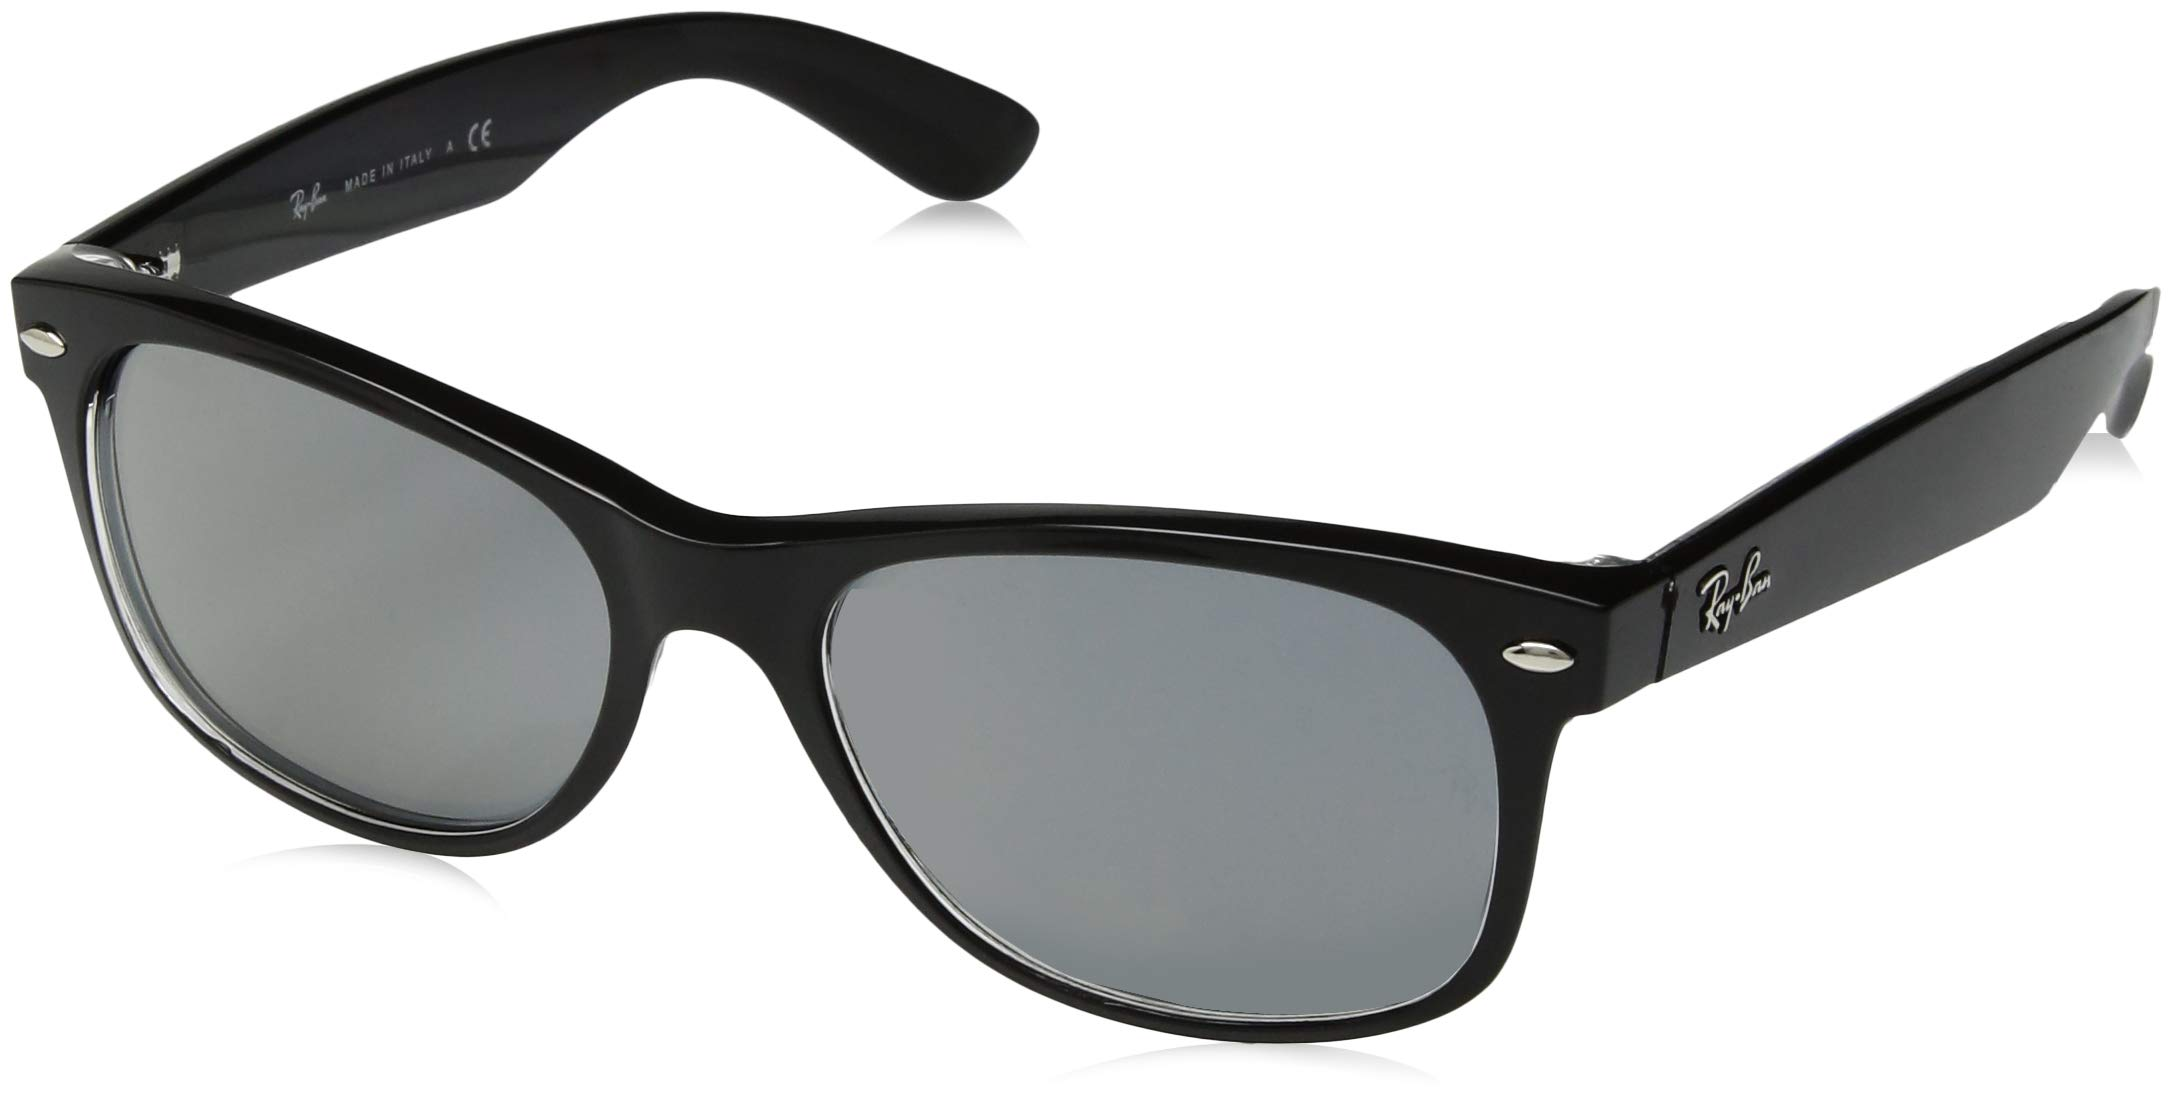 Ray-Ban RB2132 New Wayfarer Sunglasses, Black & Transparent/Blue Mirror Gold, 55 mm